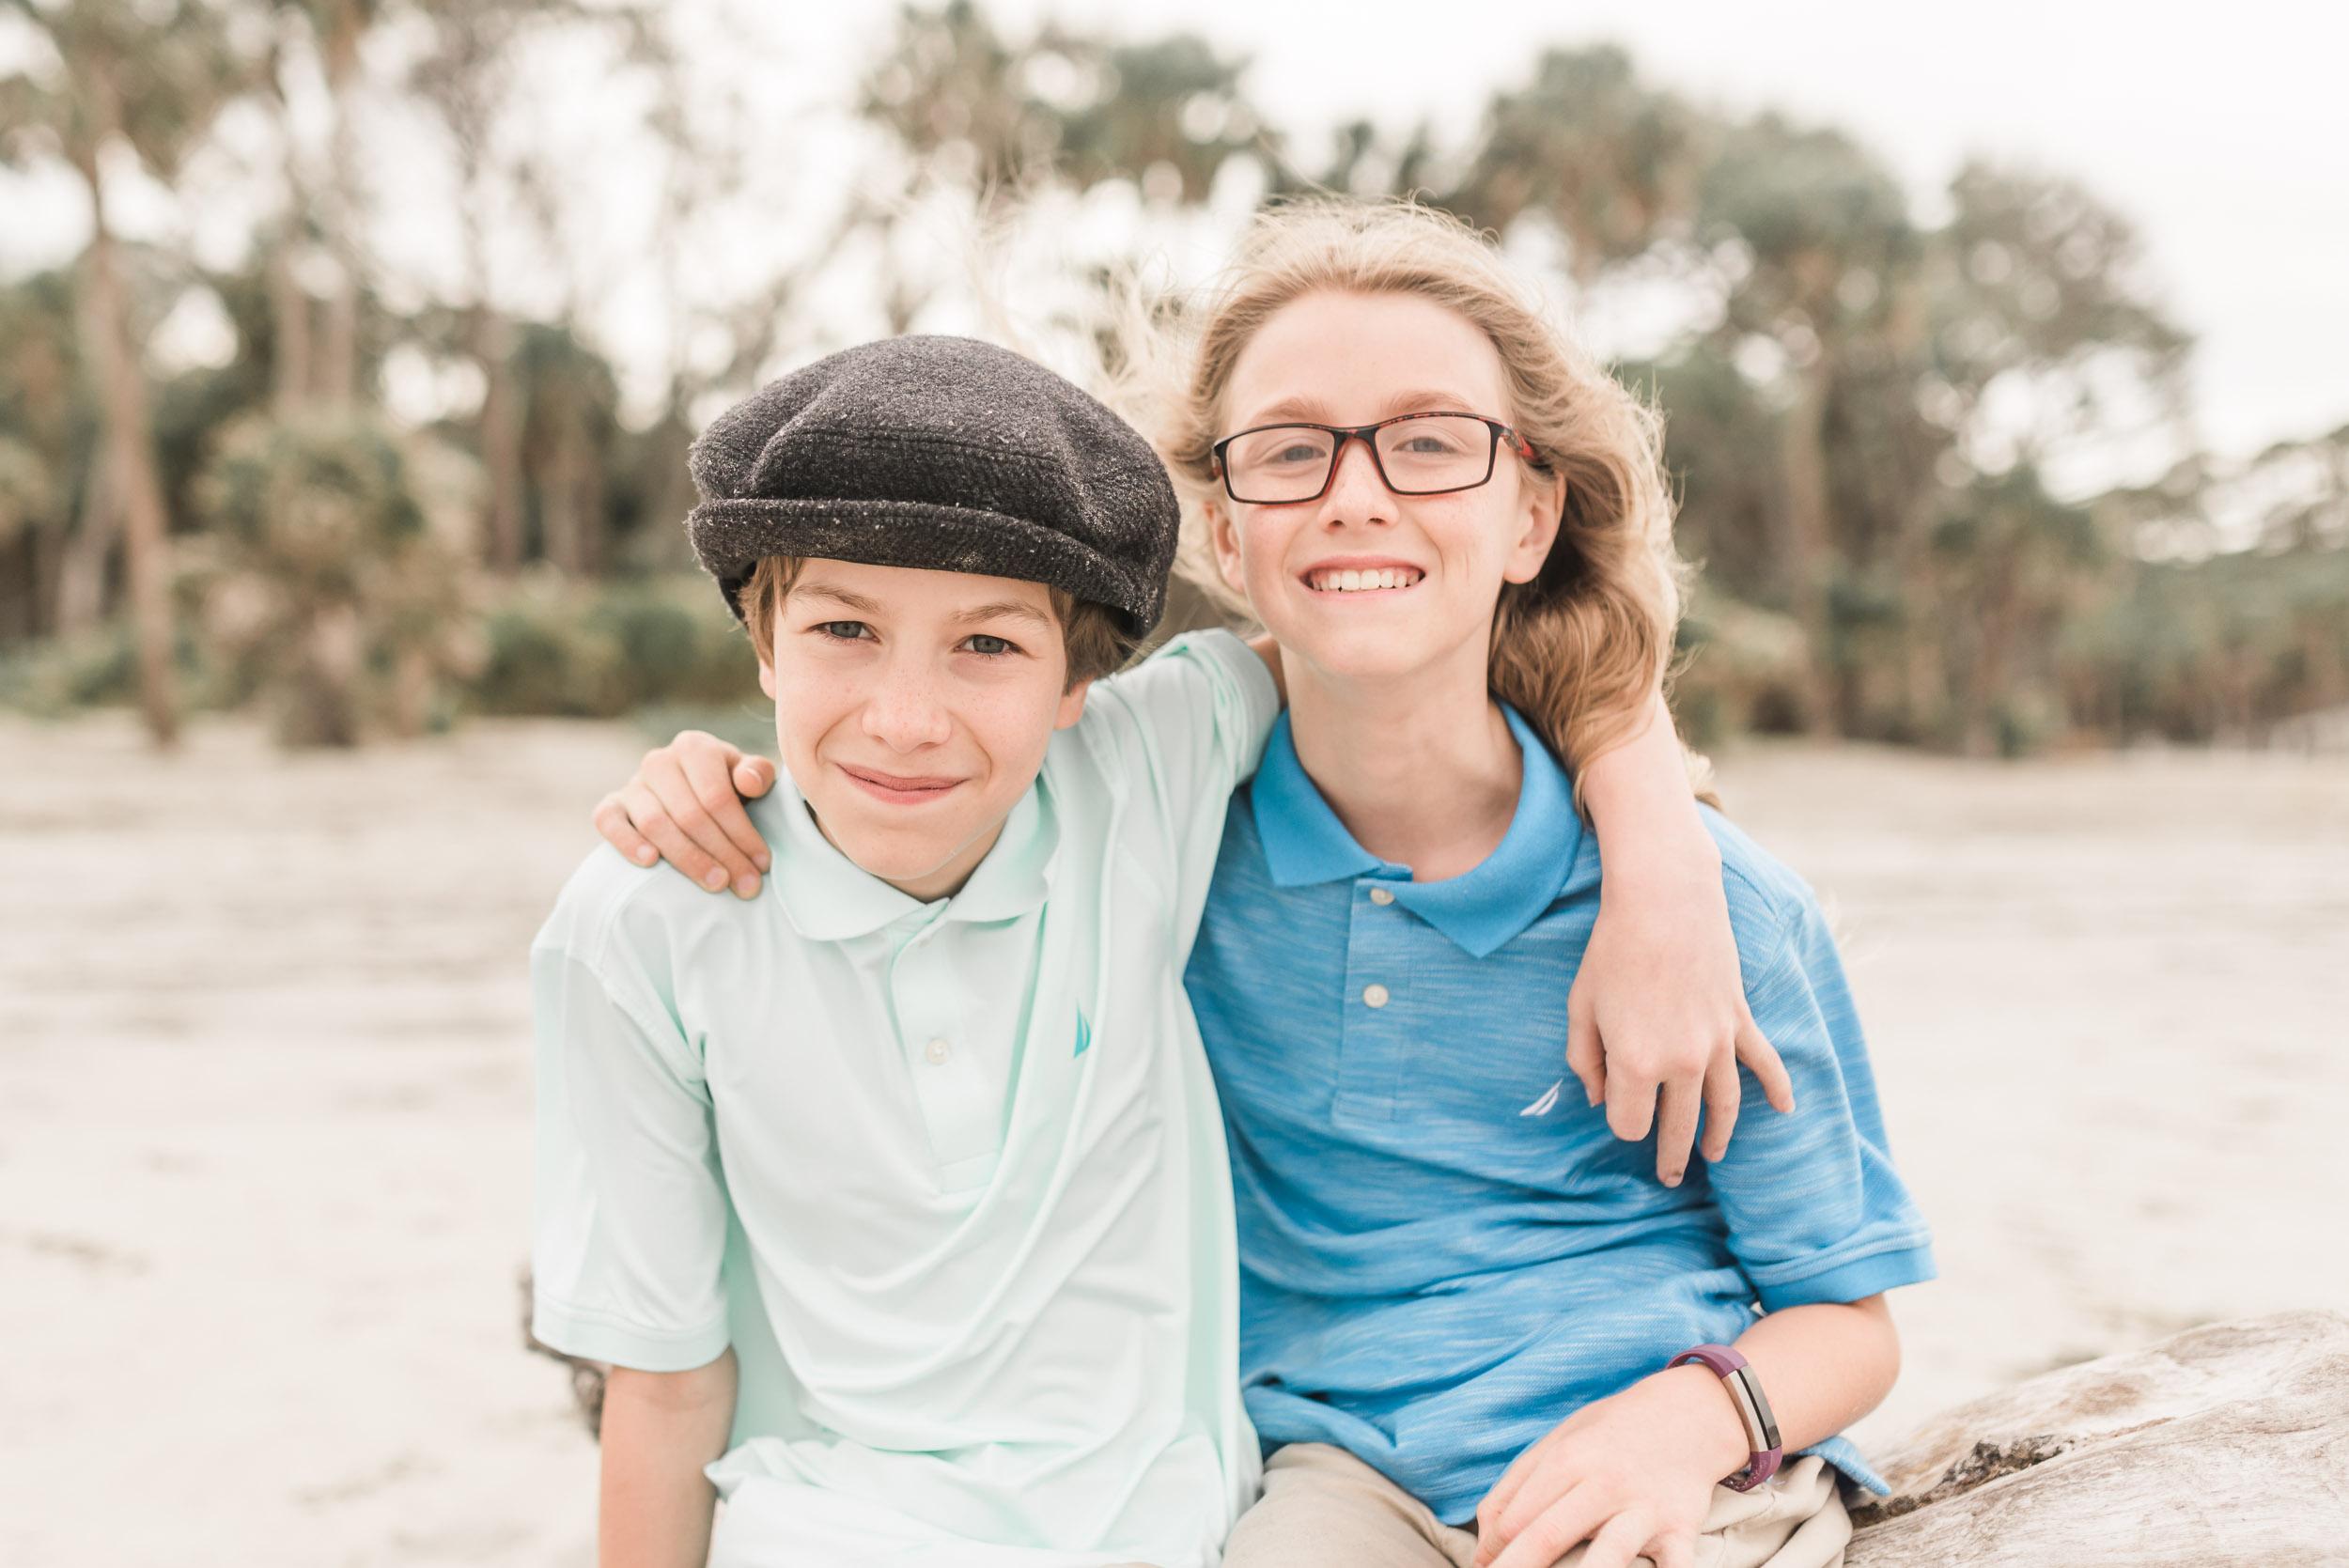 RachaelPearcePhotography_SCfamily photographer09.jpg